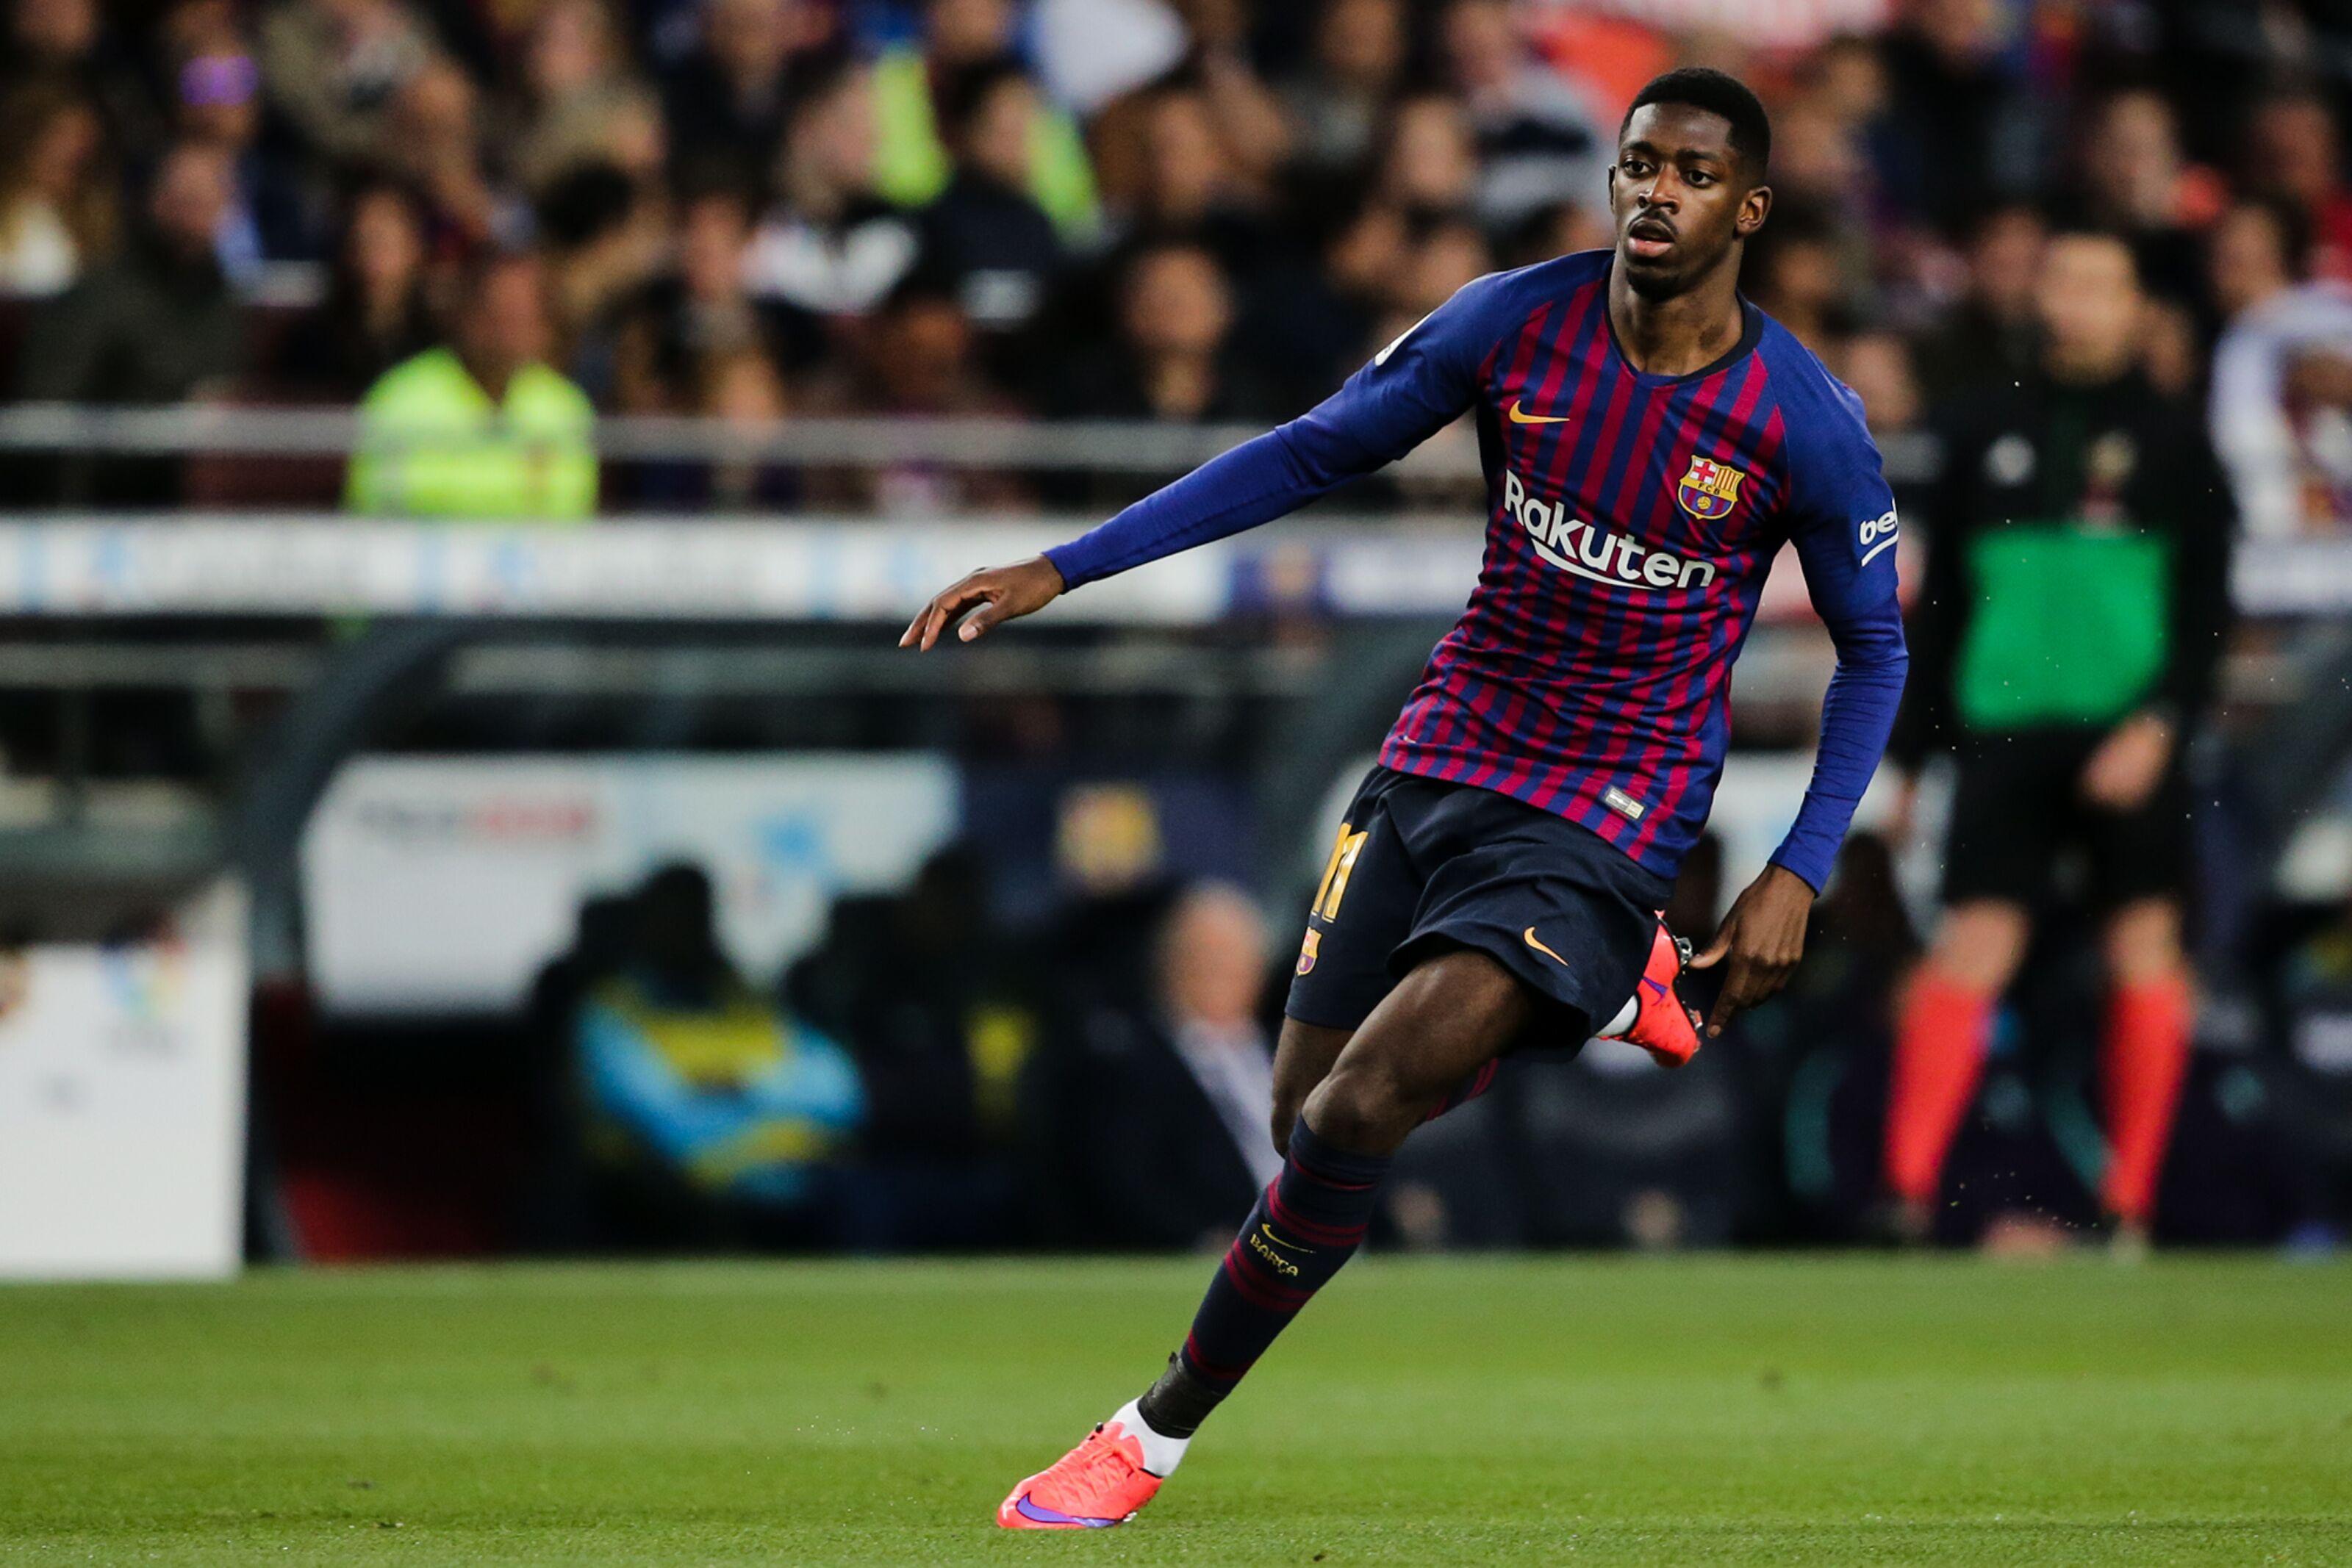 Report: Bayern Munich see Ousmane Dembele as alternative to Leroy Sane